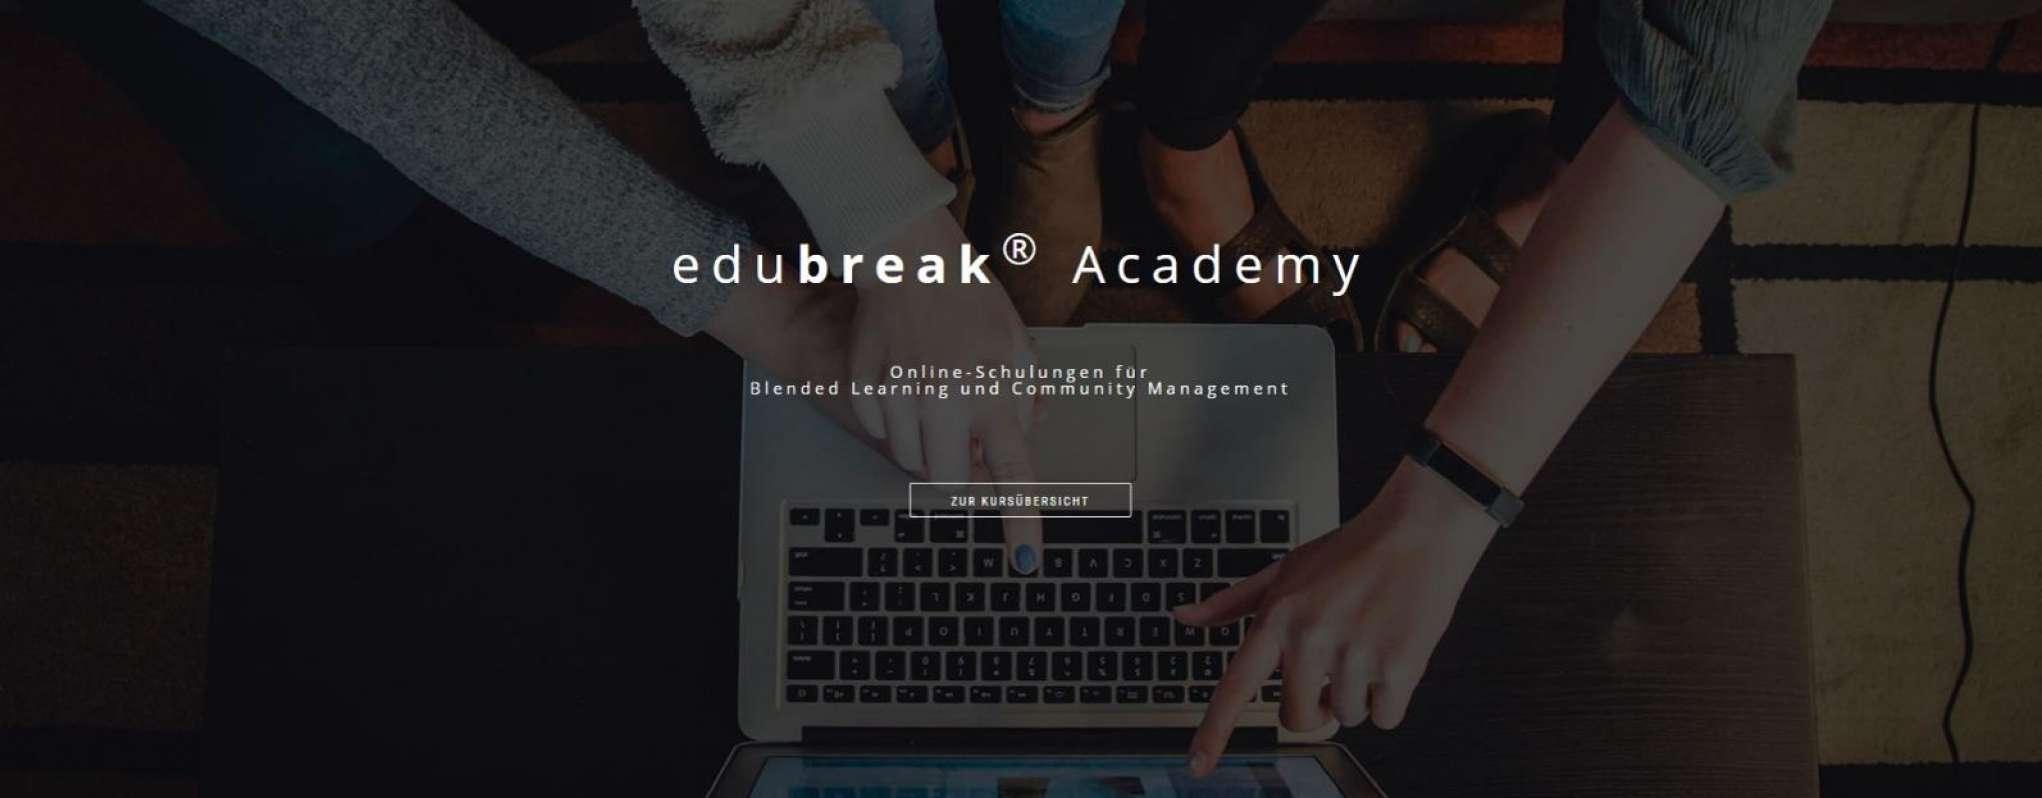 edubreak Academy